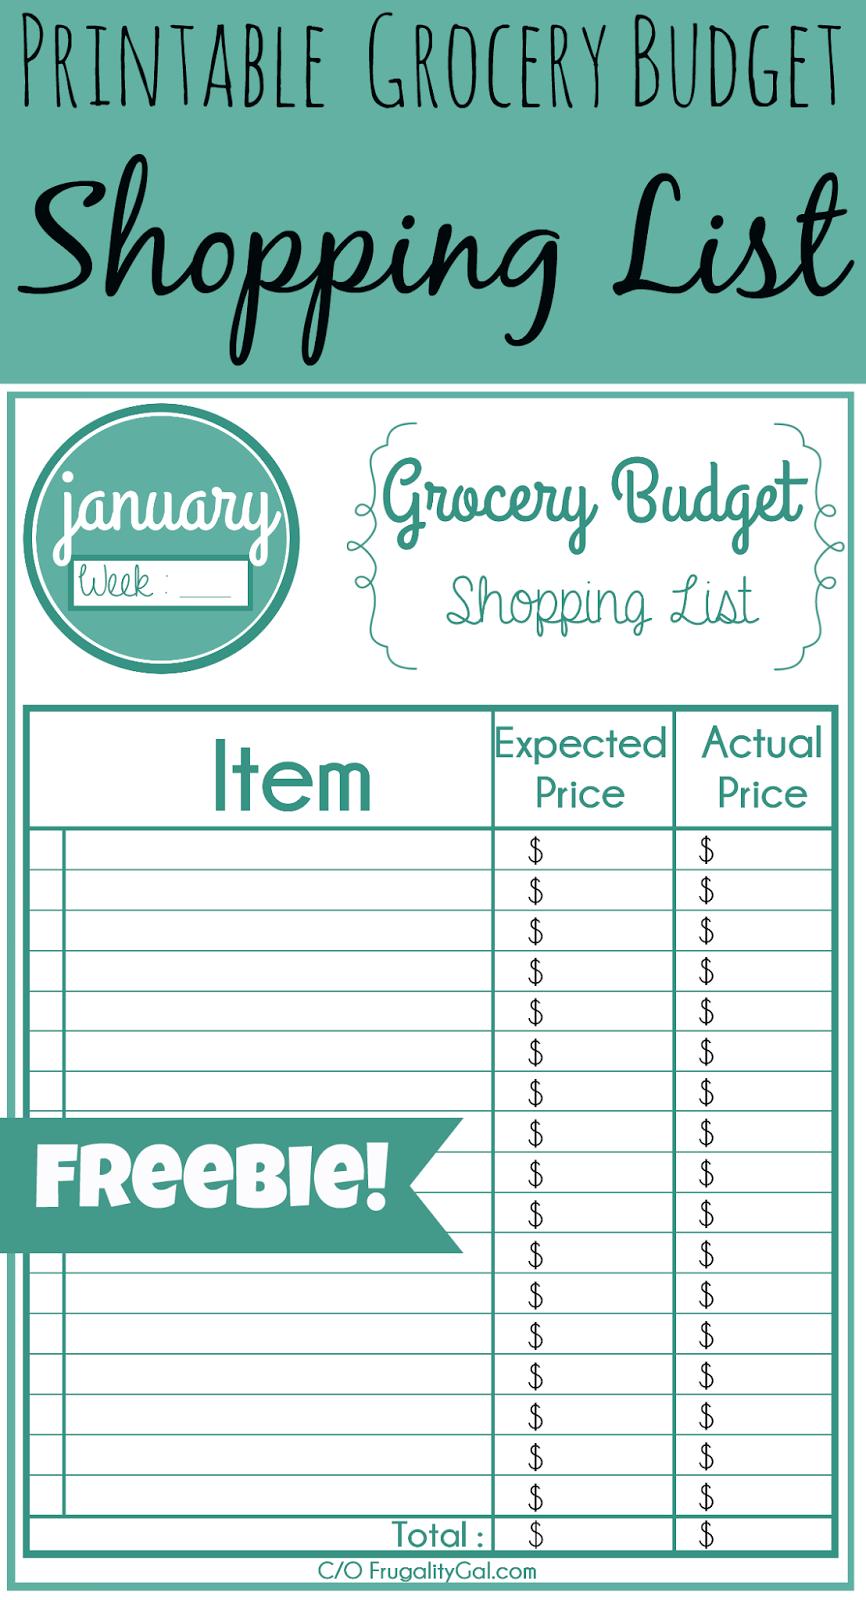 Printable Grocery List Frugality Gal – Free Printable Grocery List Template